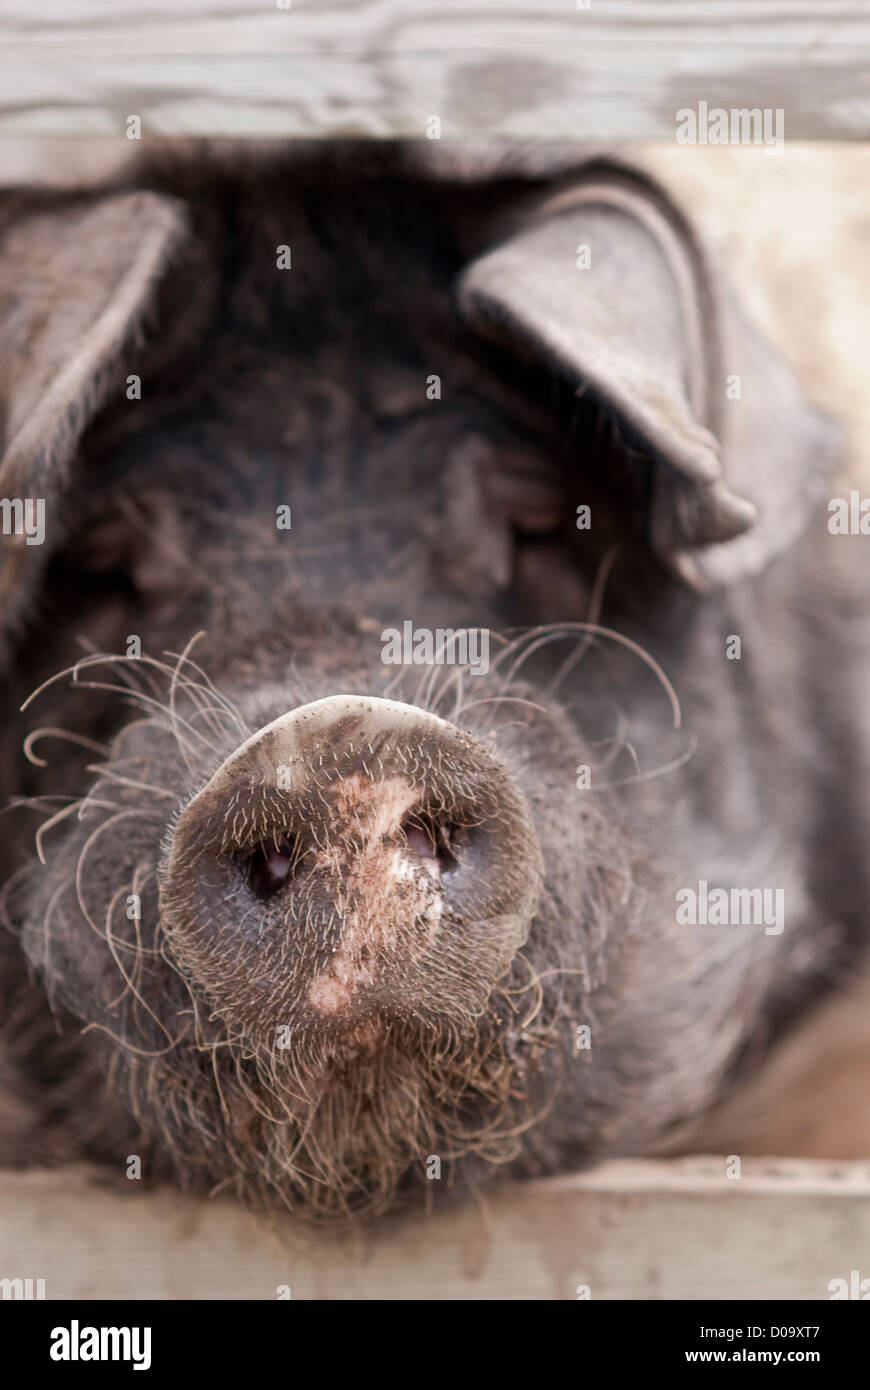 Look Through Fence Stockfotos & Look Through Fence Bilder - Alamy